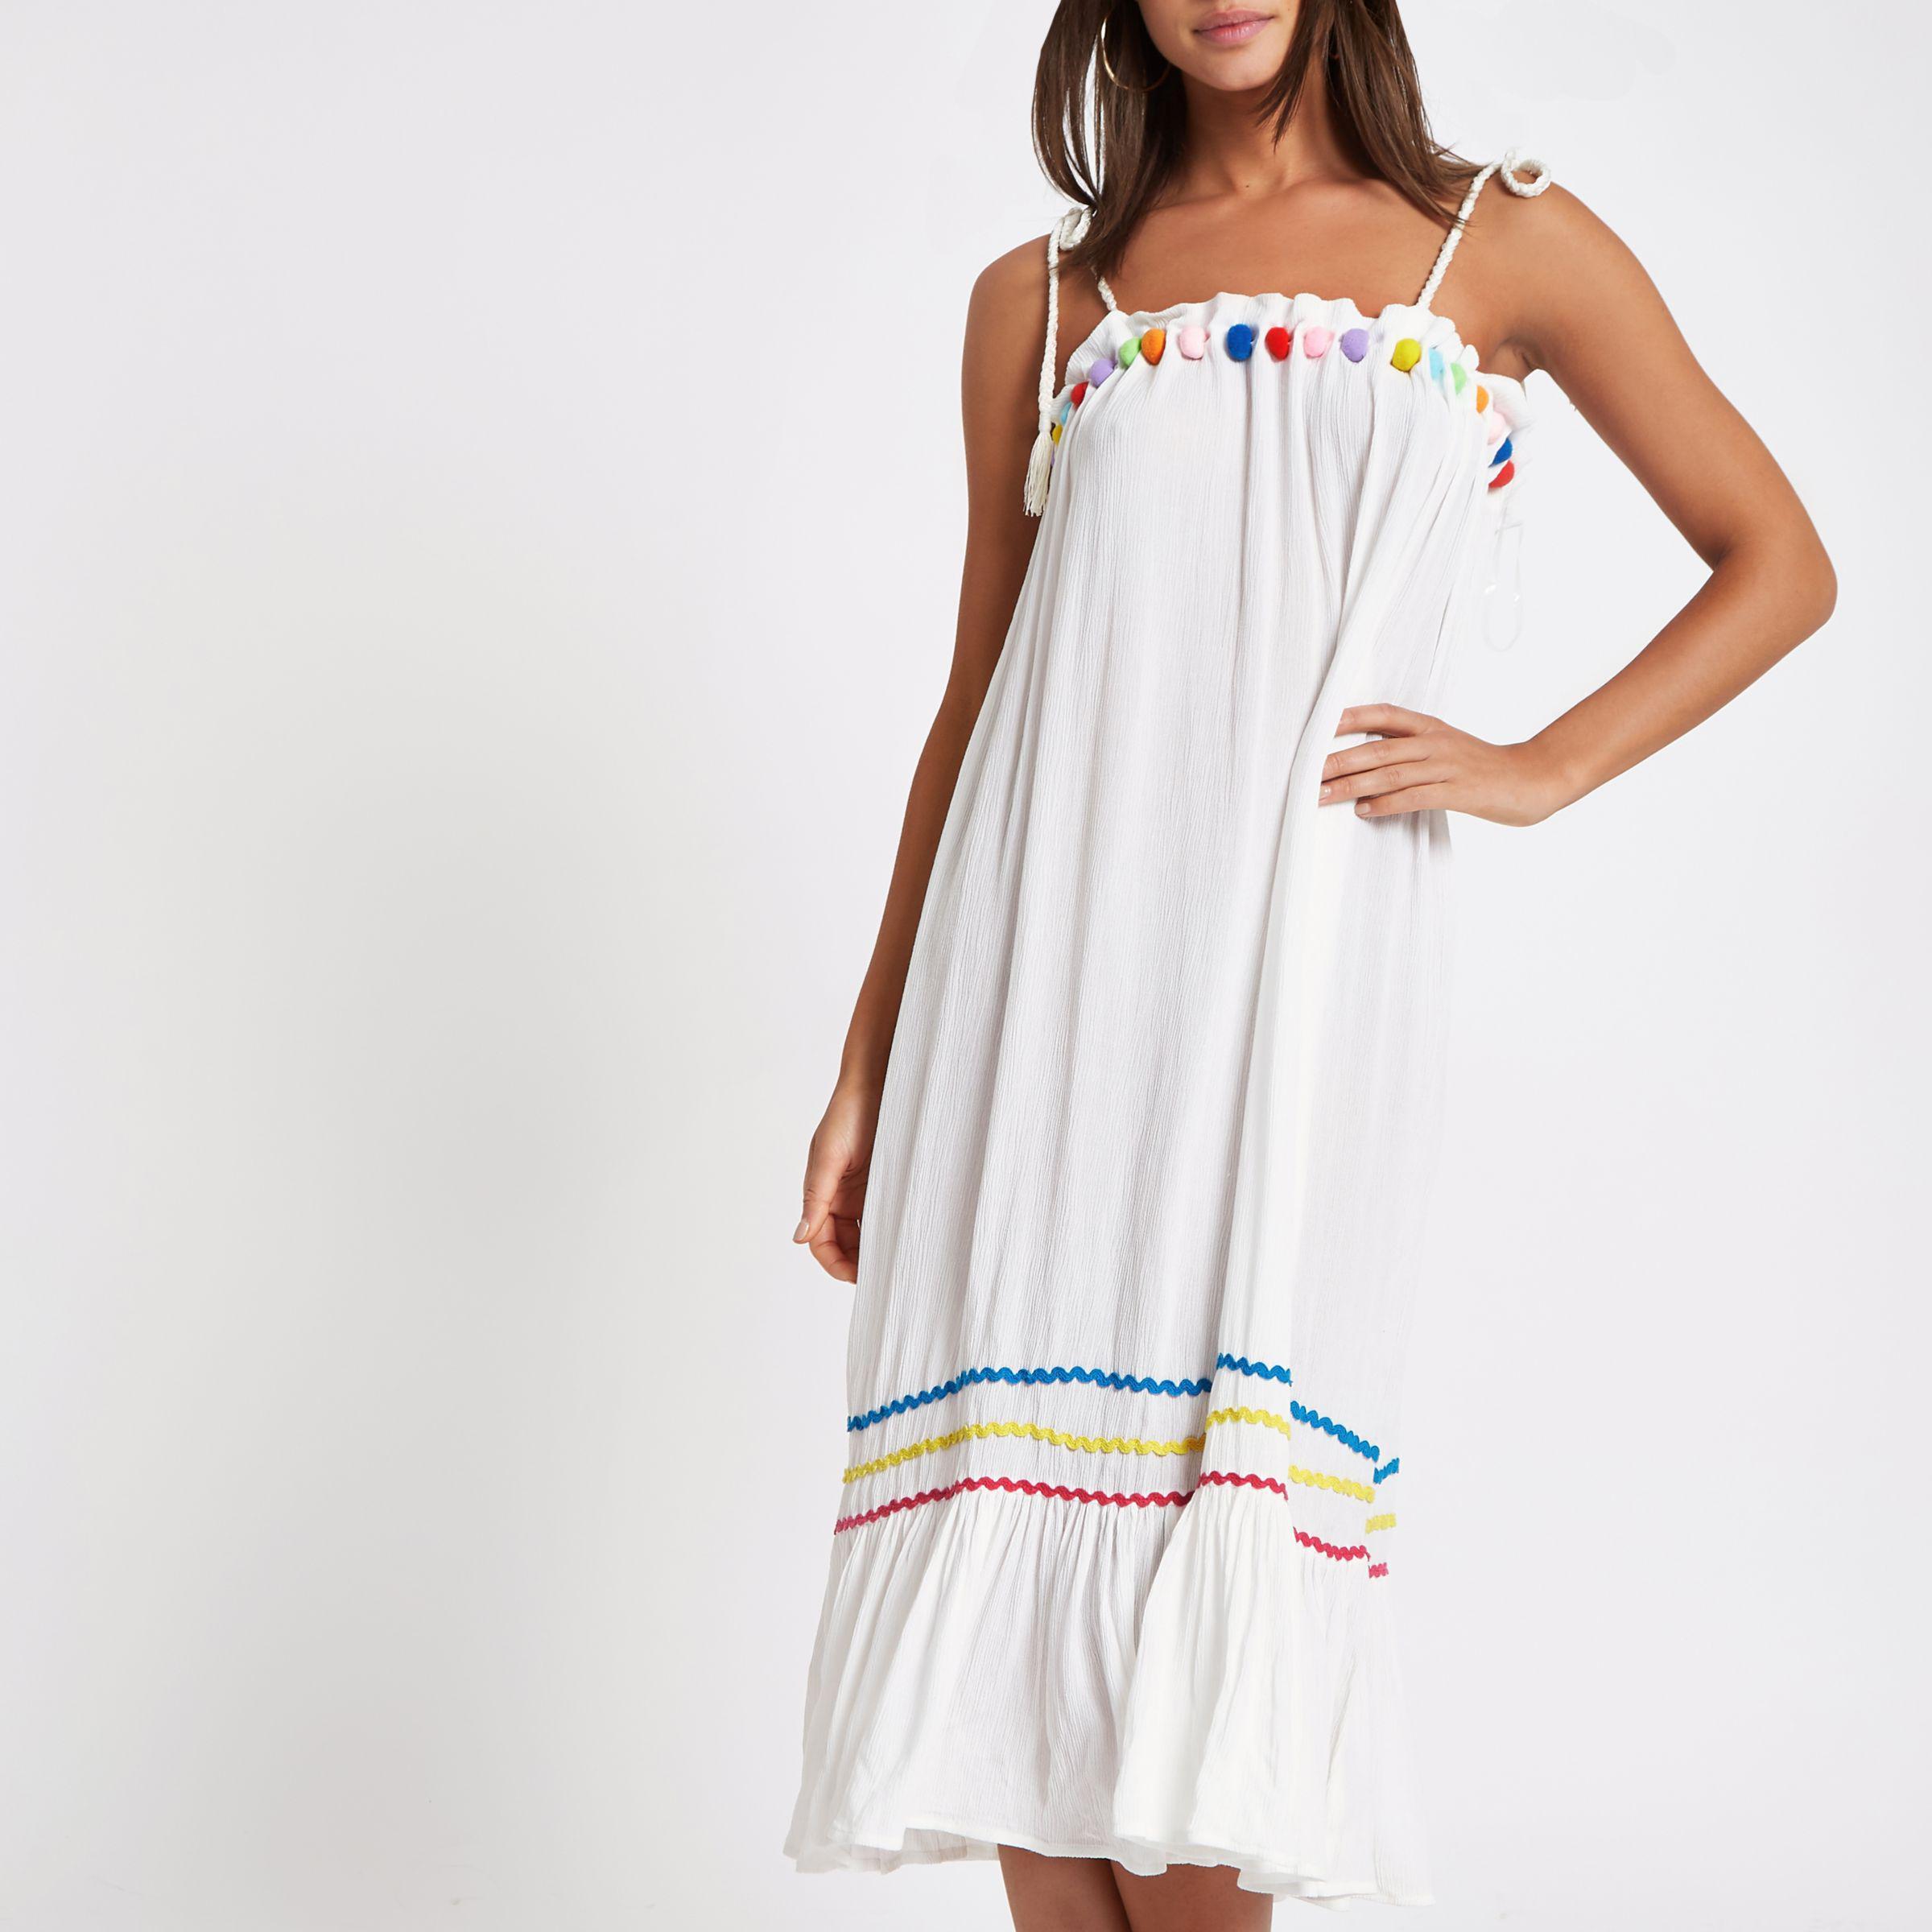 682ae649b2 River Island White Pom Pom Trim Midi Beach Dress in White - Lyst